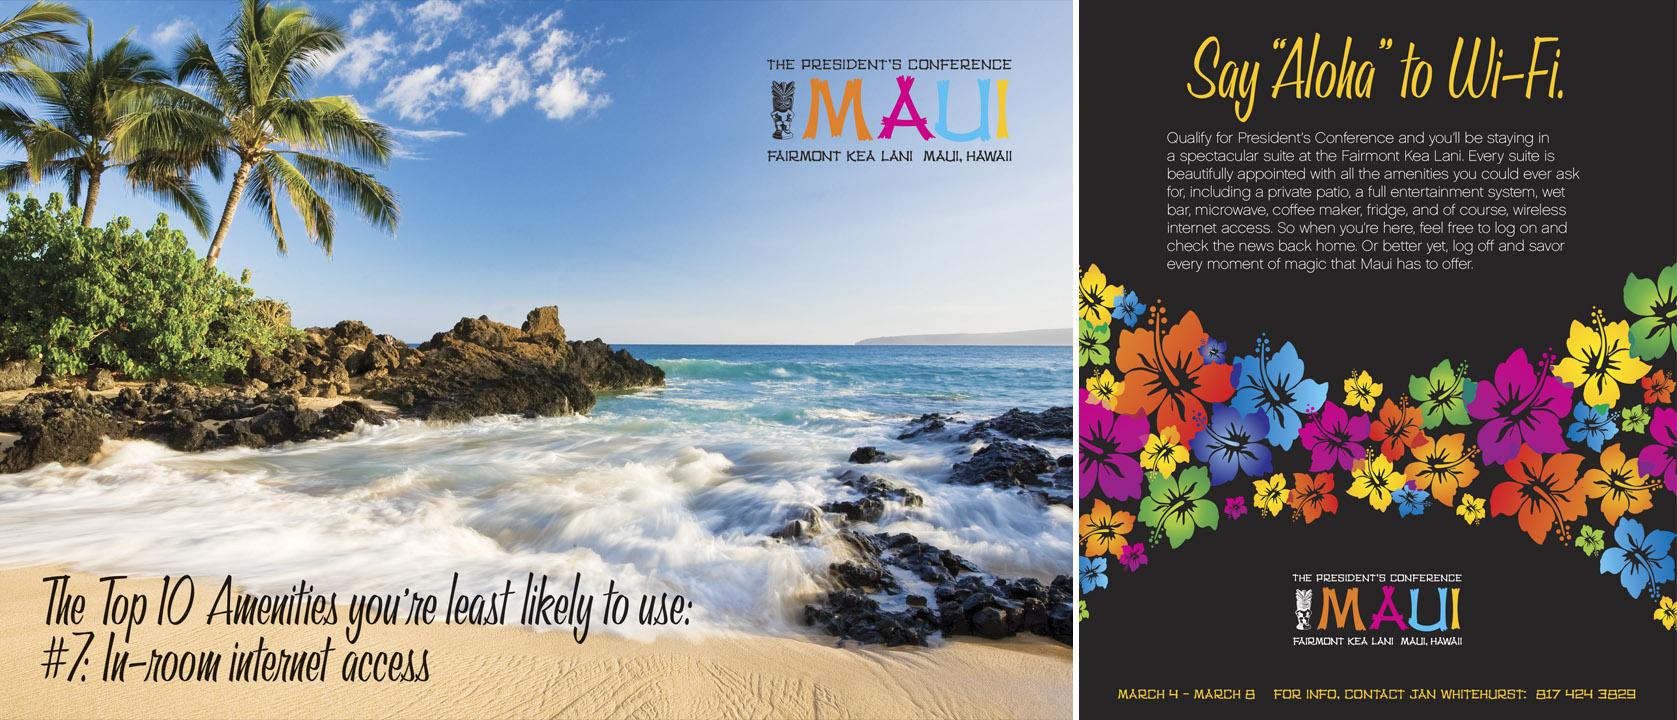 Maui Promo Card 1.jpg